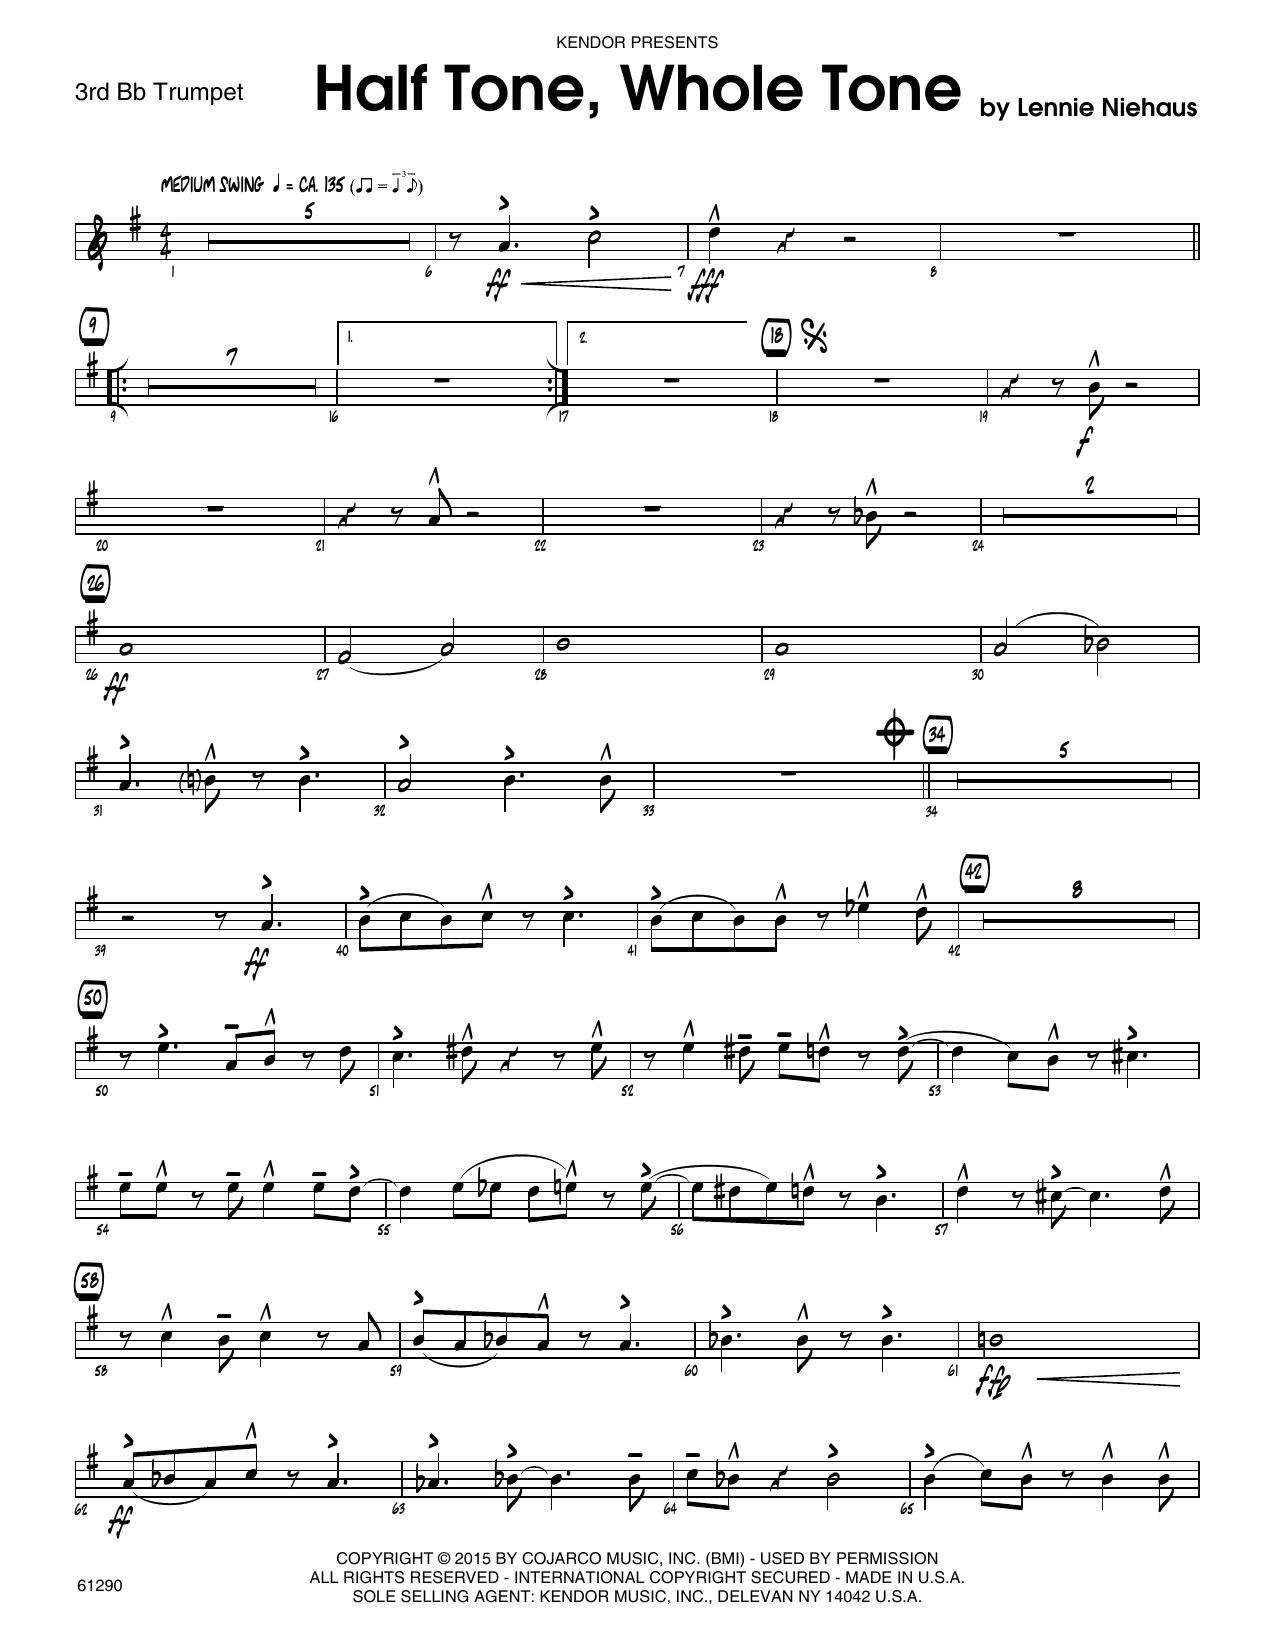 Half Tone, Whole Tone - 3rd Bb Trumpet Sheet Music